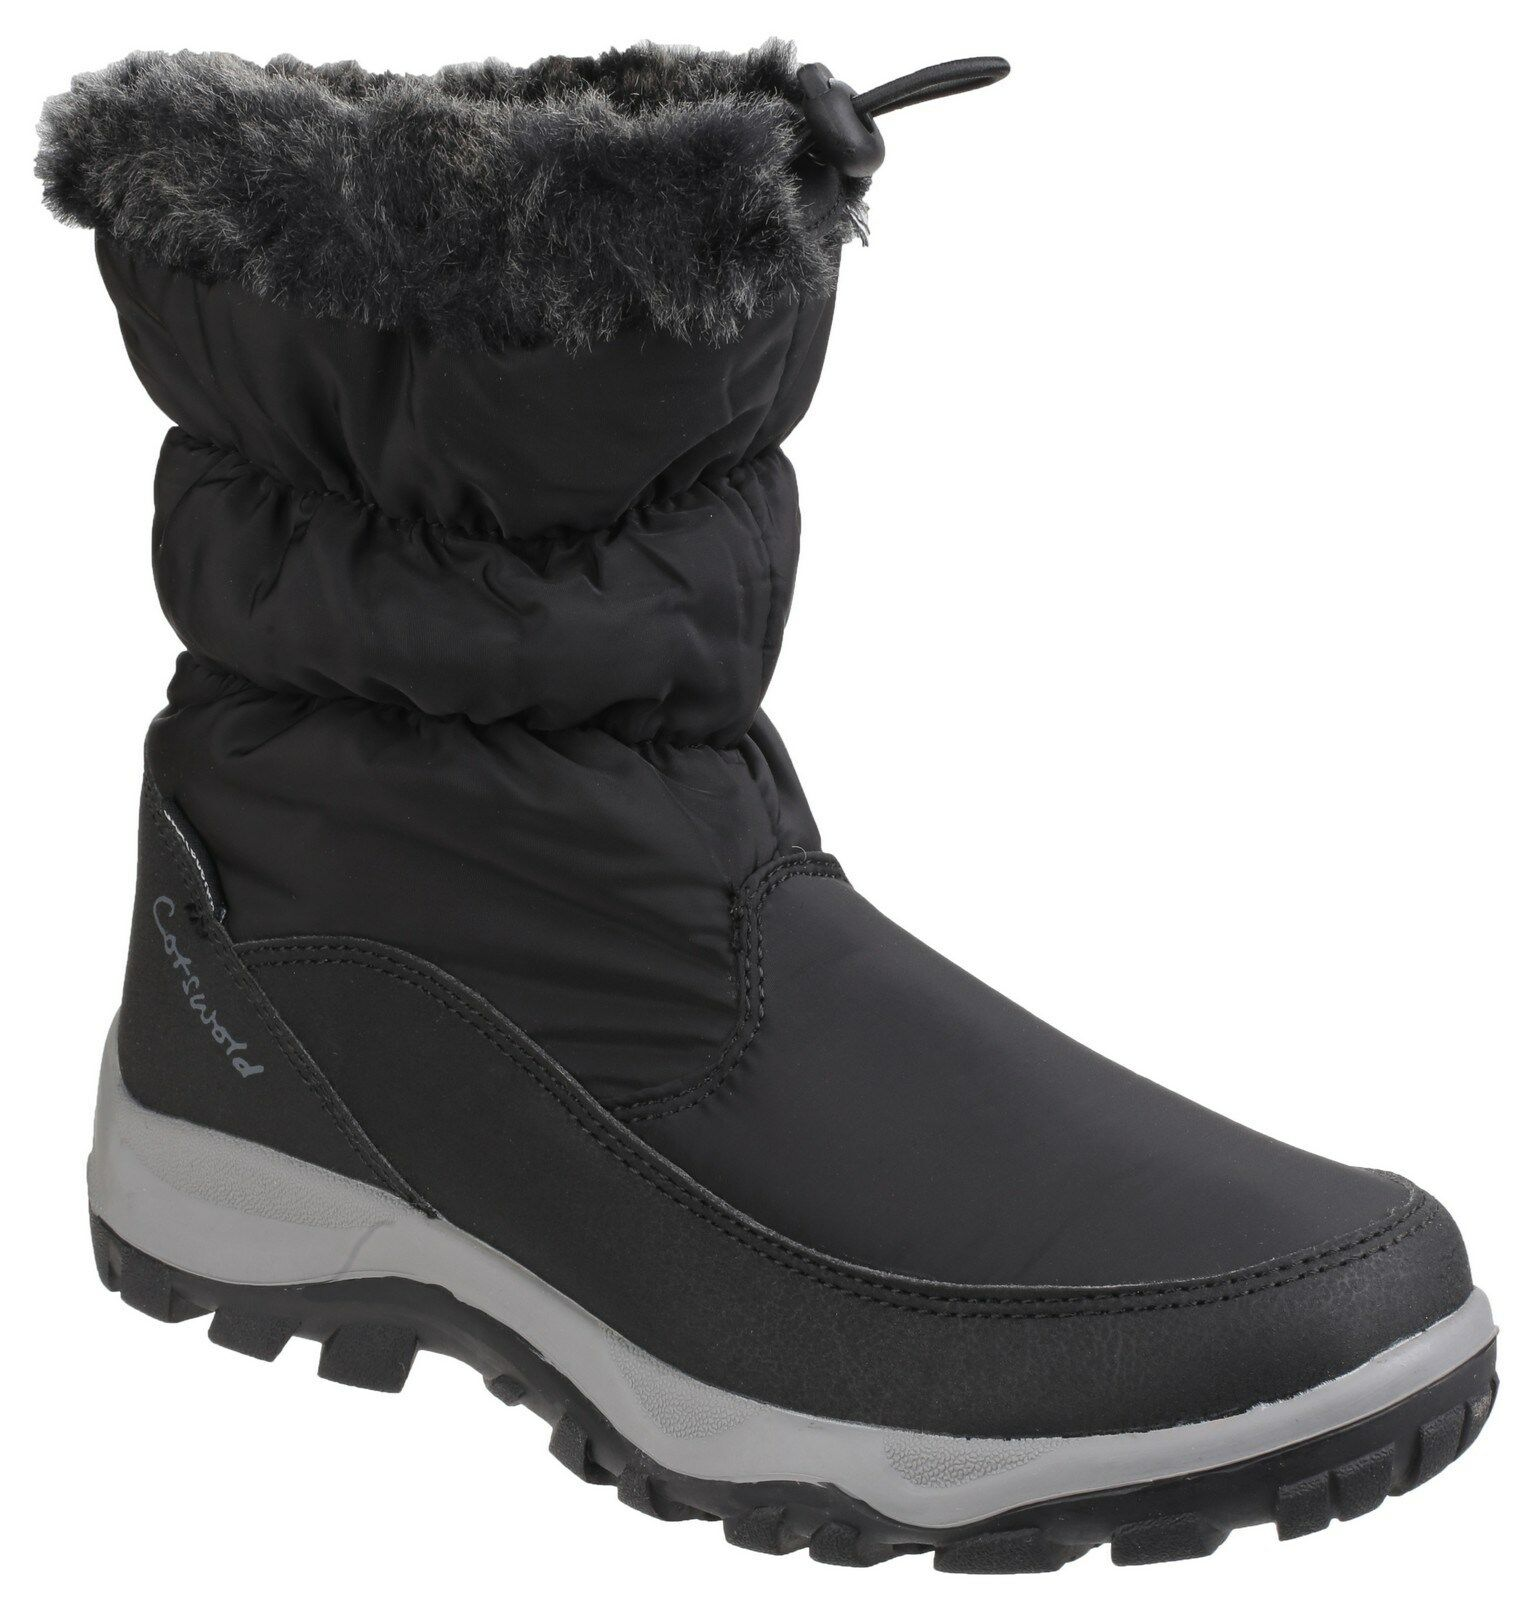 Cotswold Frost Wellington Waterproof Pull On Wellington Frost Snow Boots UK3-8 db988c